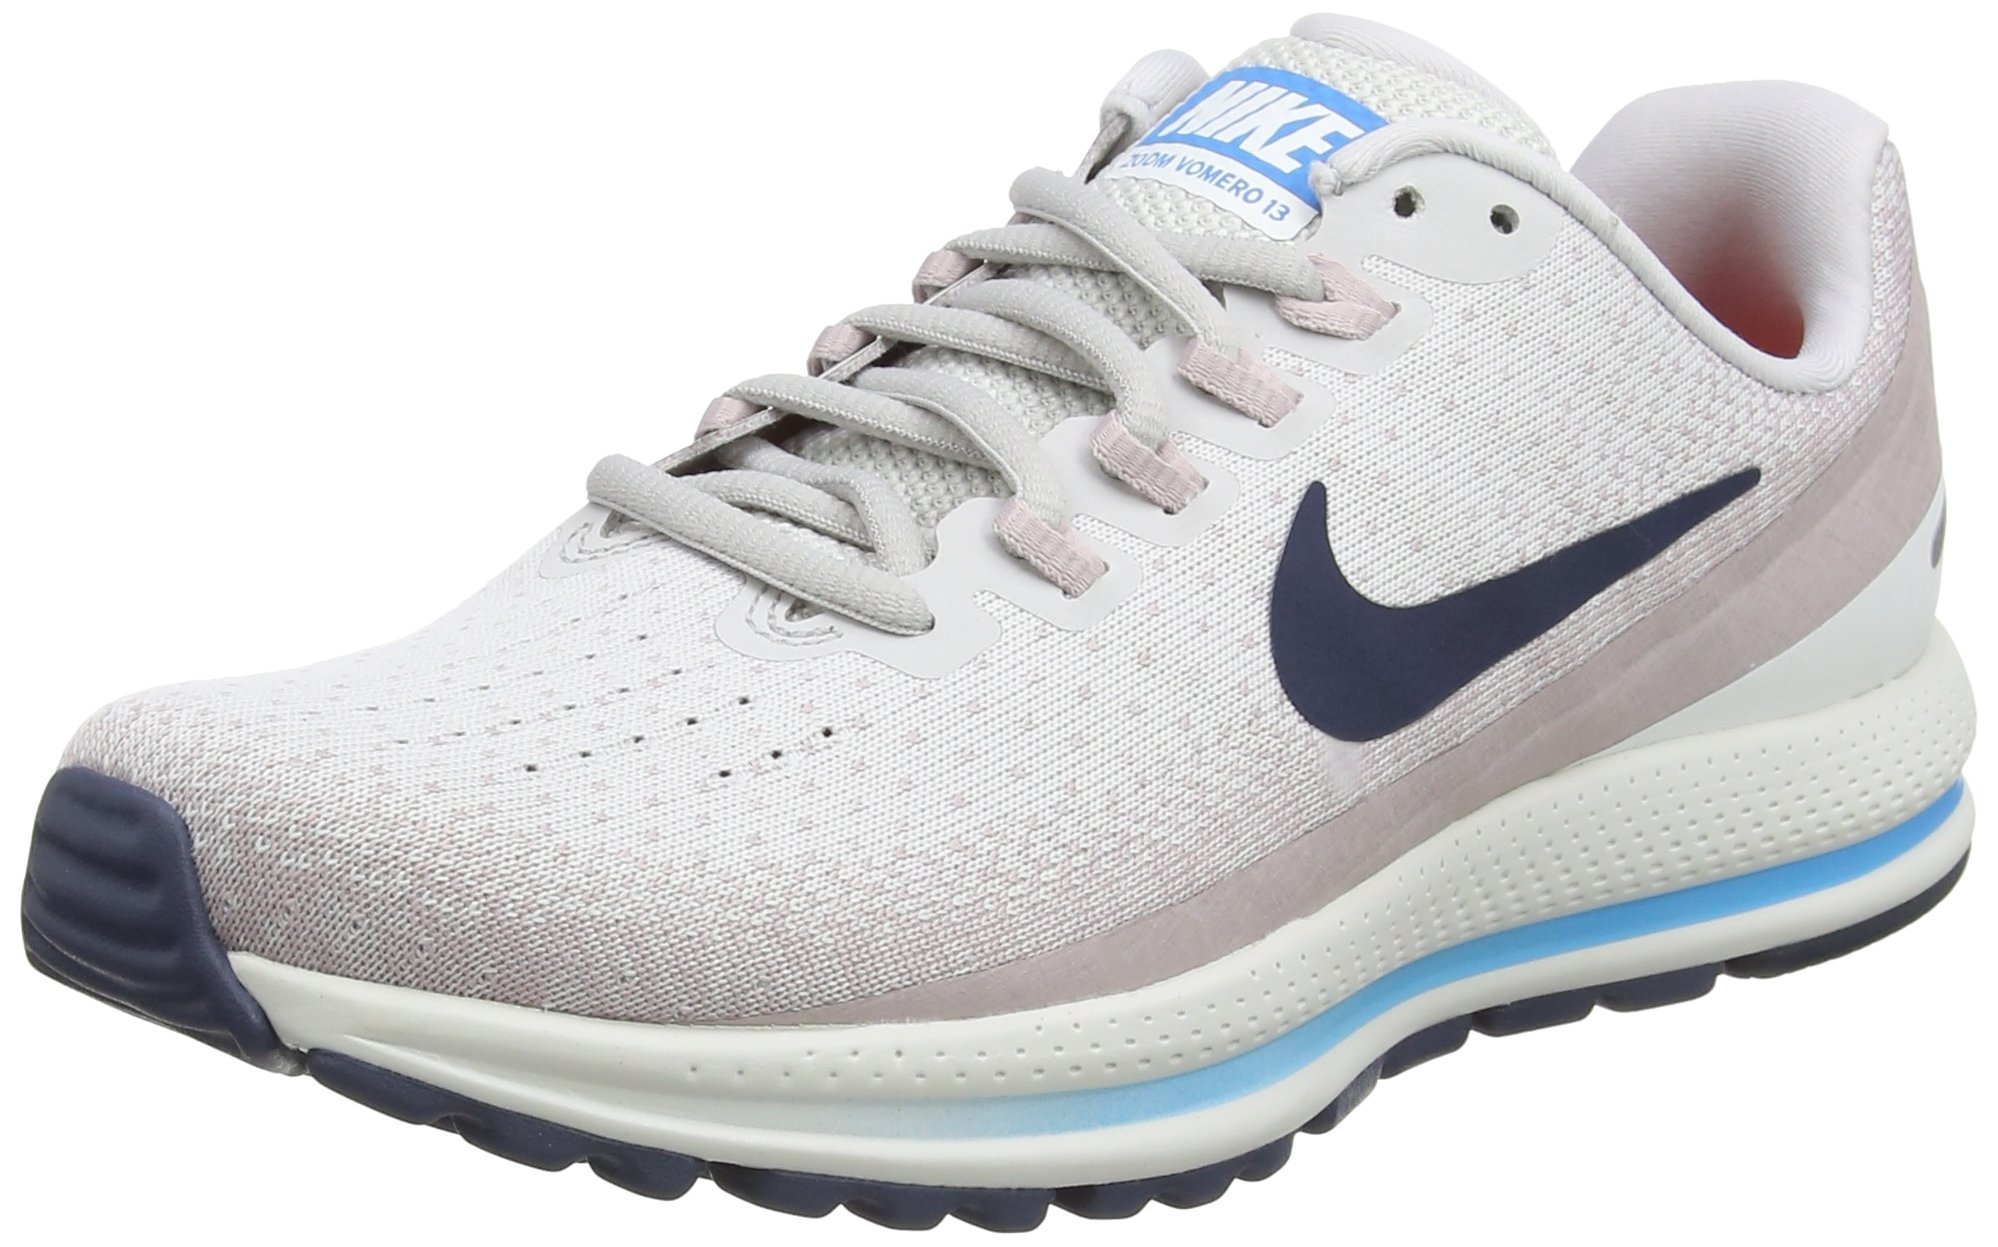 eceb088d0b62b Galleon - NIKE Women s Zoom Vomero 13 Running Shoes (Vast Grey Thunder  Blue